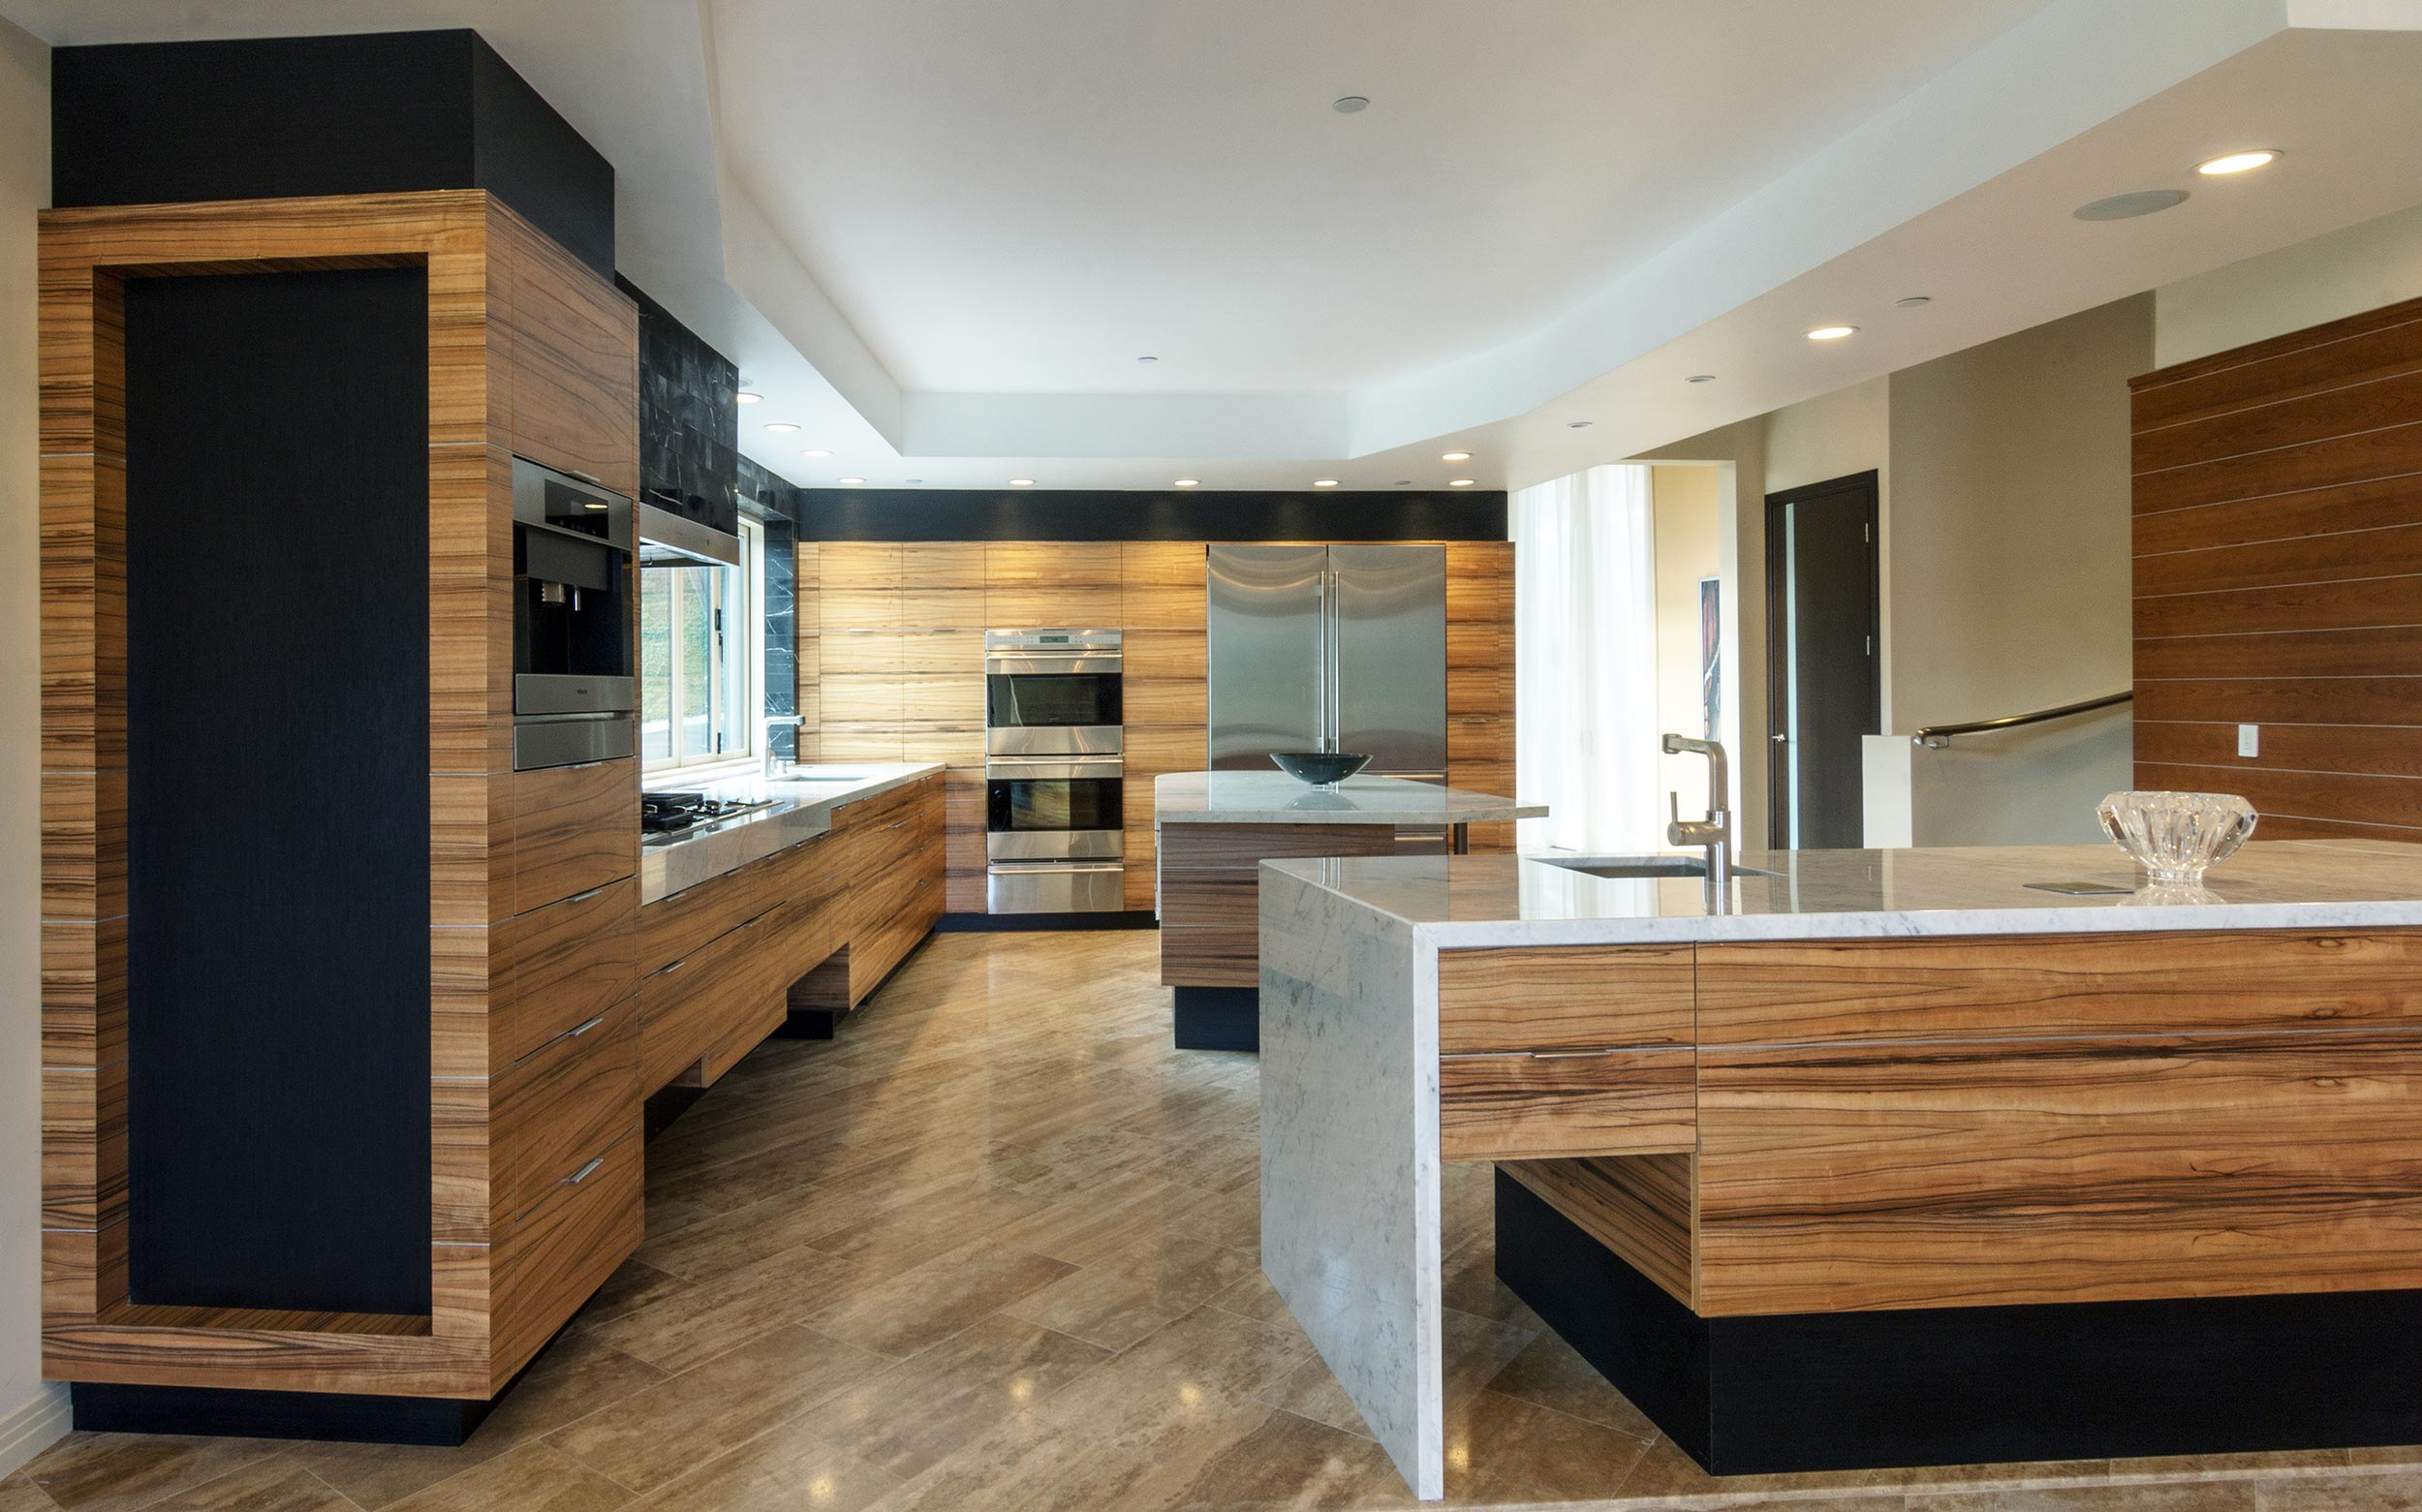 monte-cielo-house-archillusion-design-interior-design-kitchen.jpg